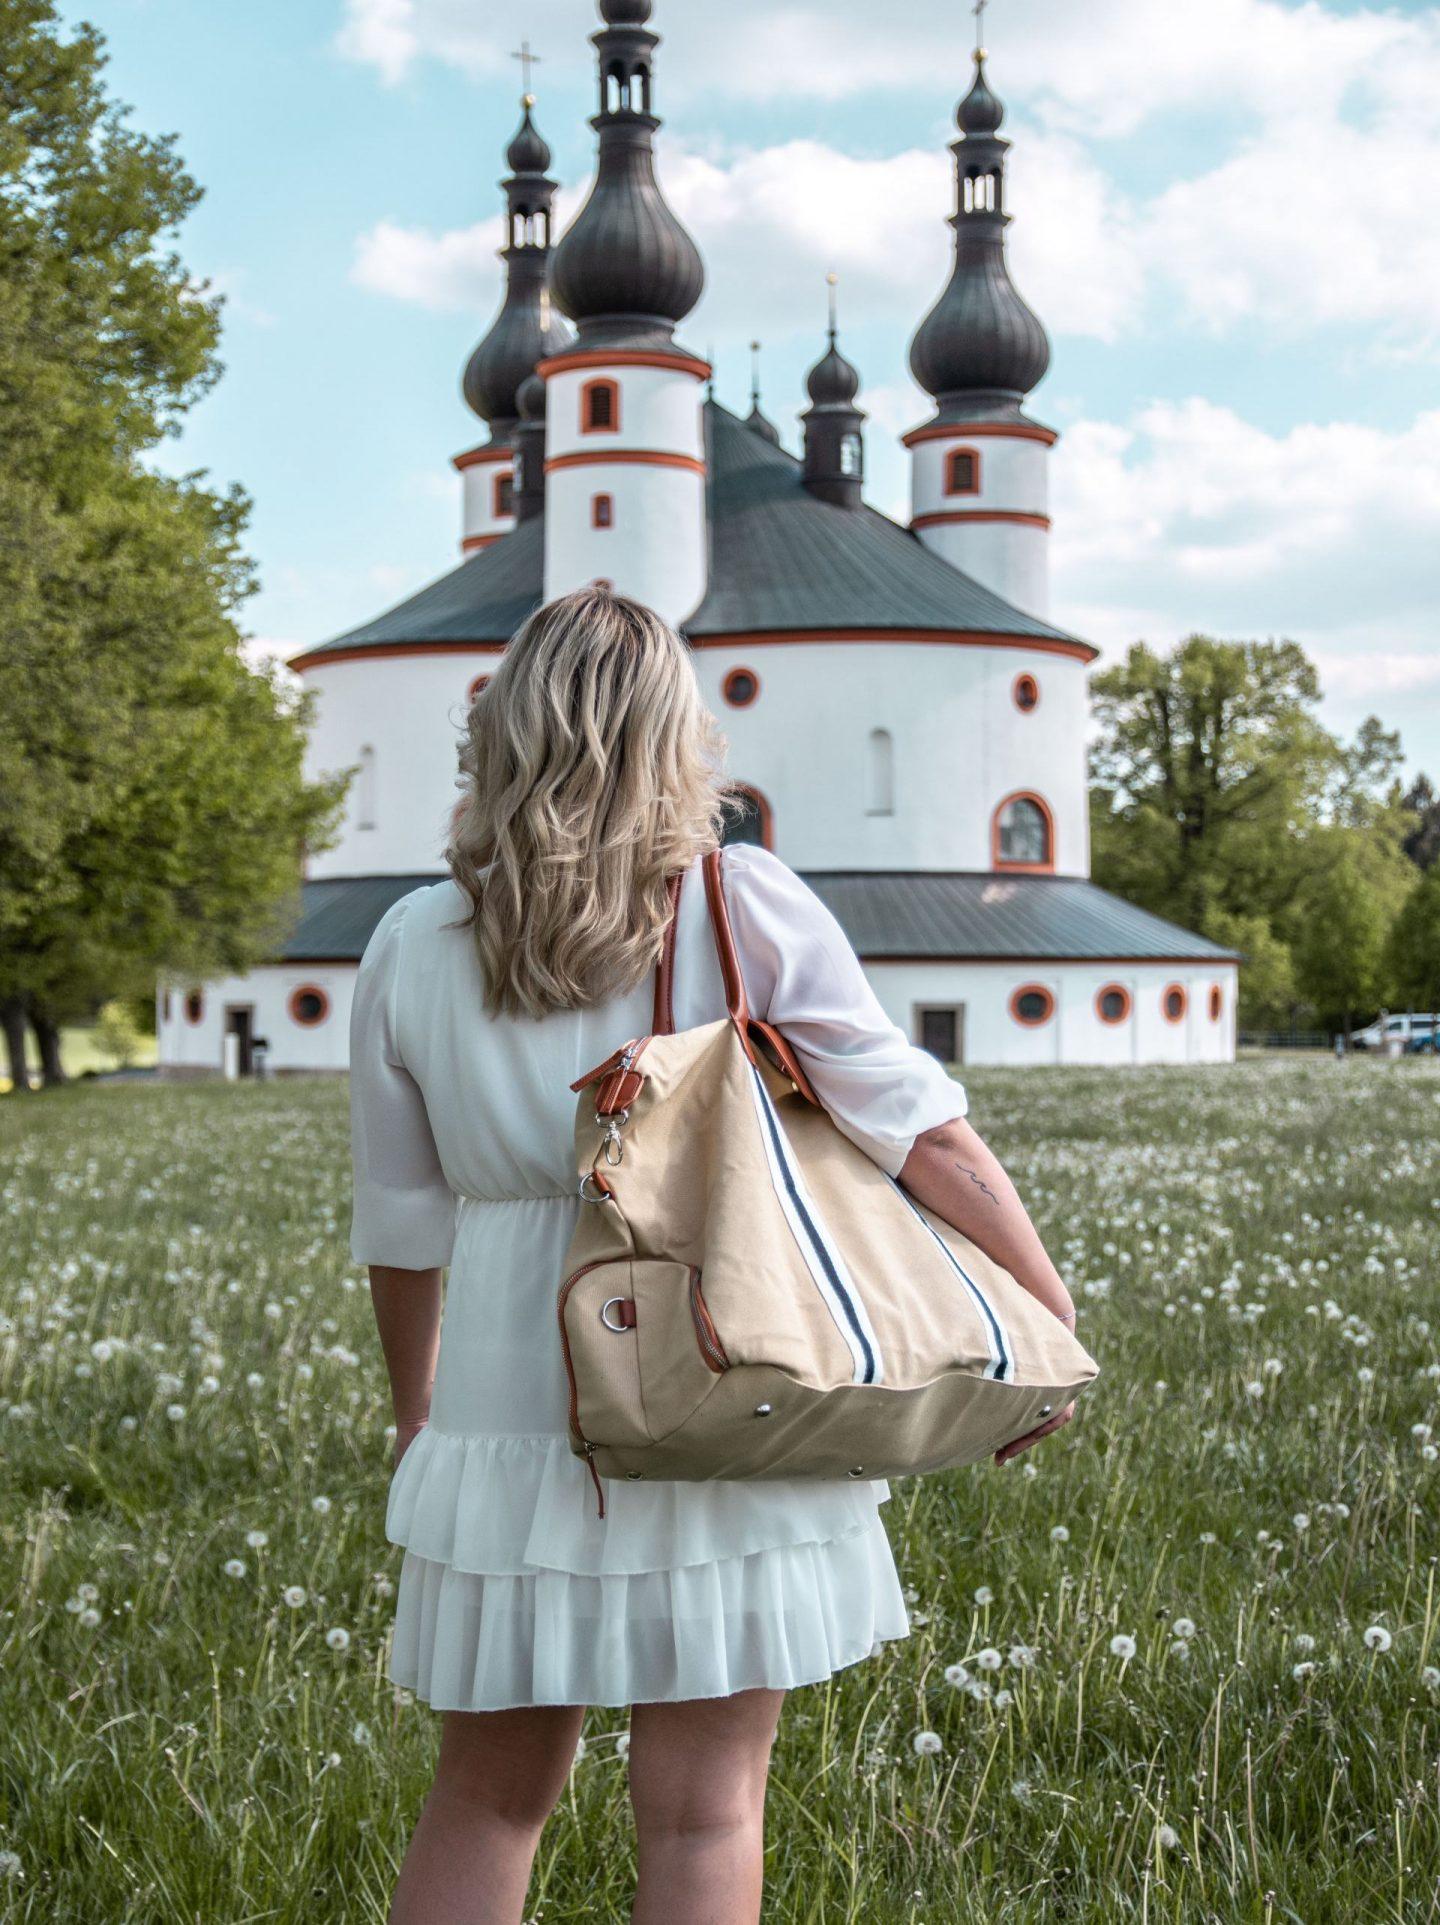 Wallfahrtskirche Kappl Waldsassen